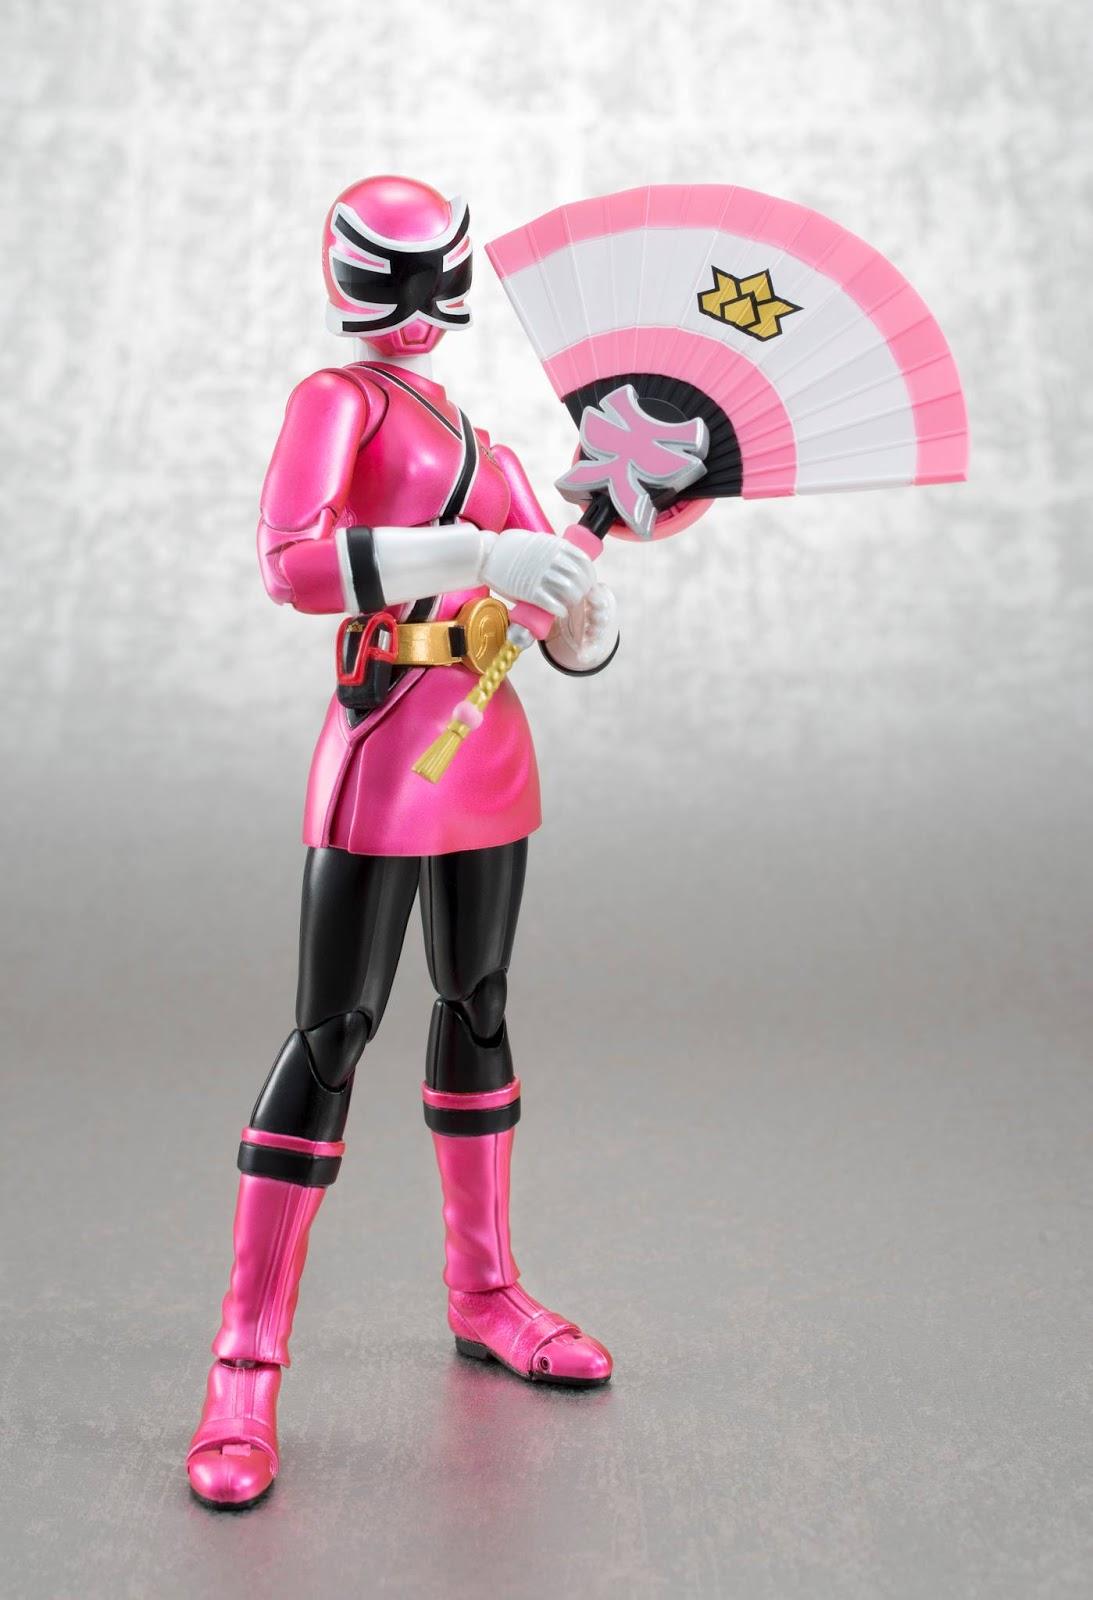 Sentaifive S Tokusatsu Multiverse Power Rangers Sdcc